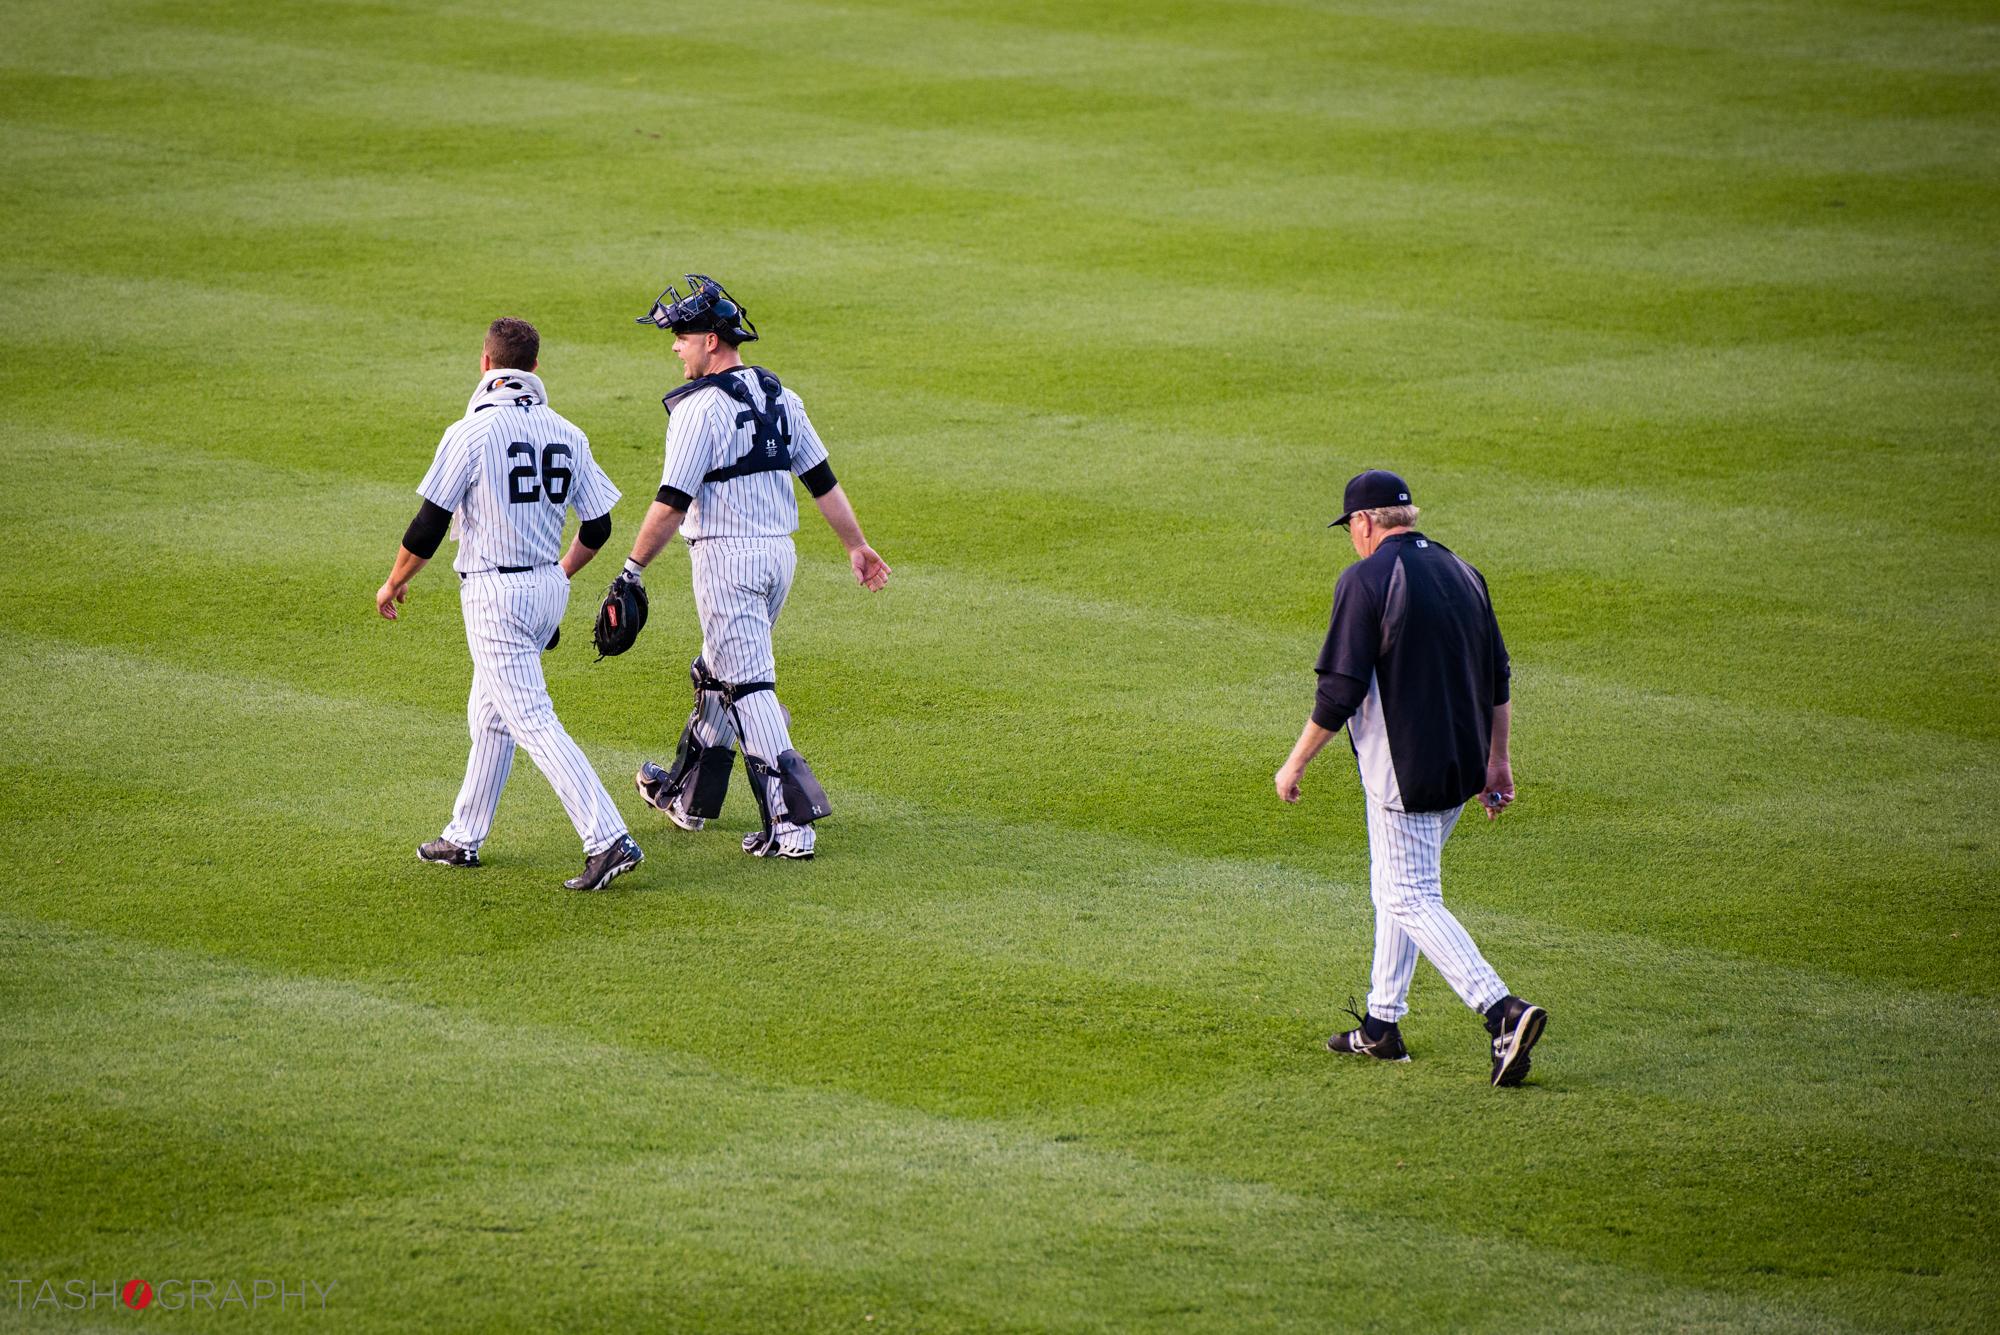 Yankees-090314-1.jpg